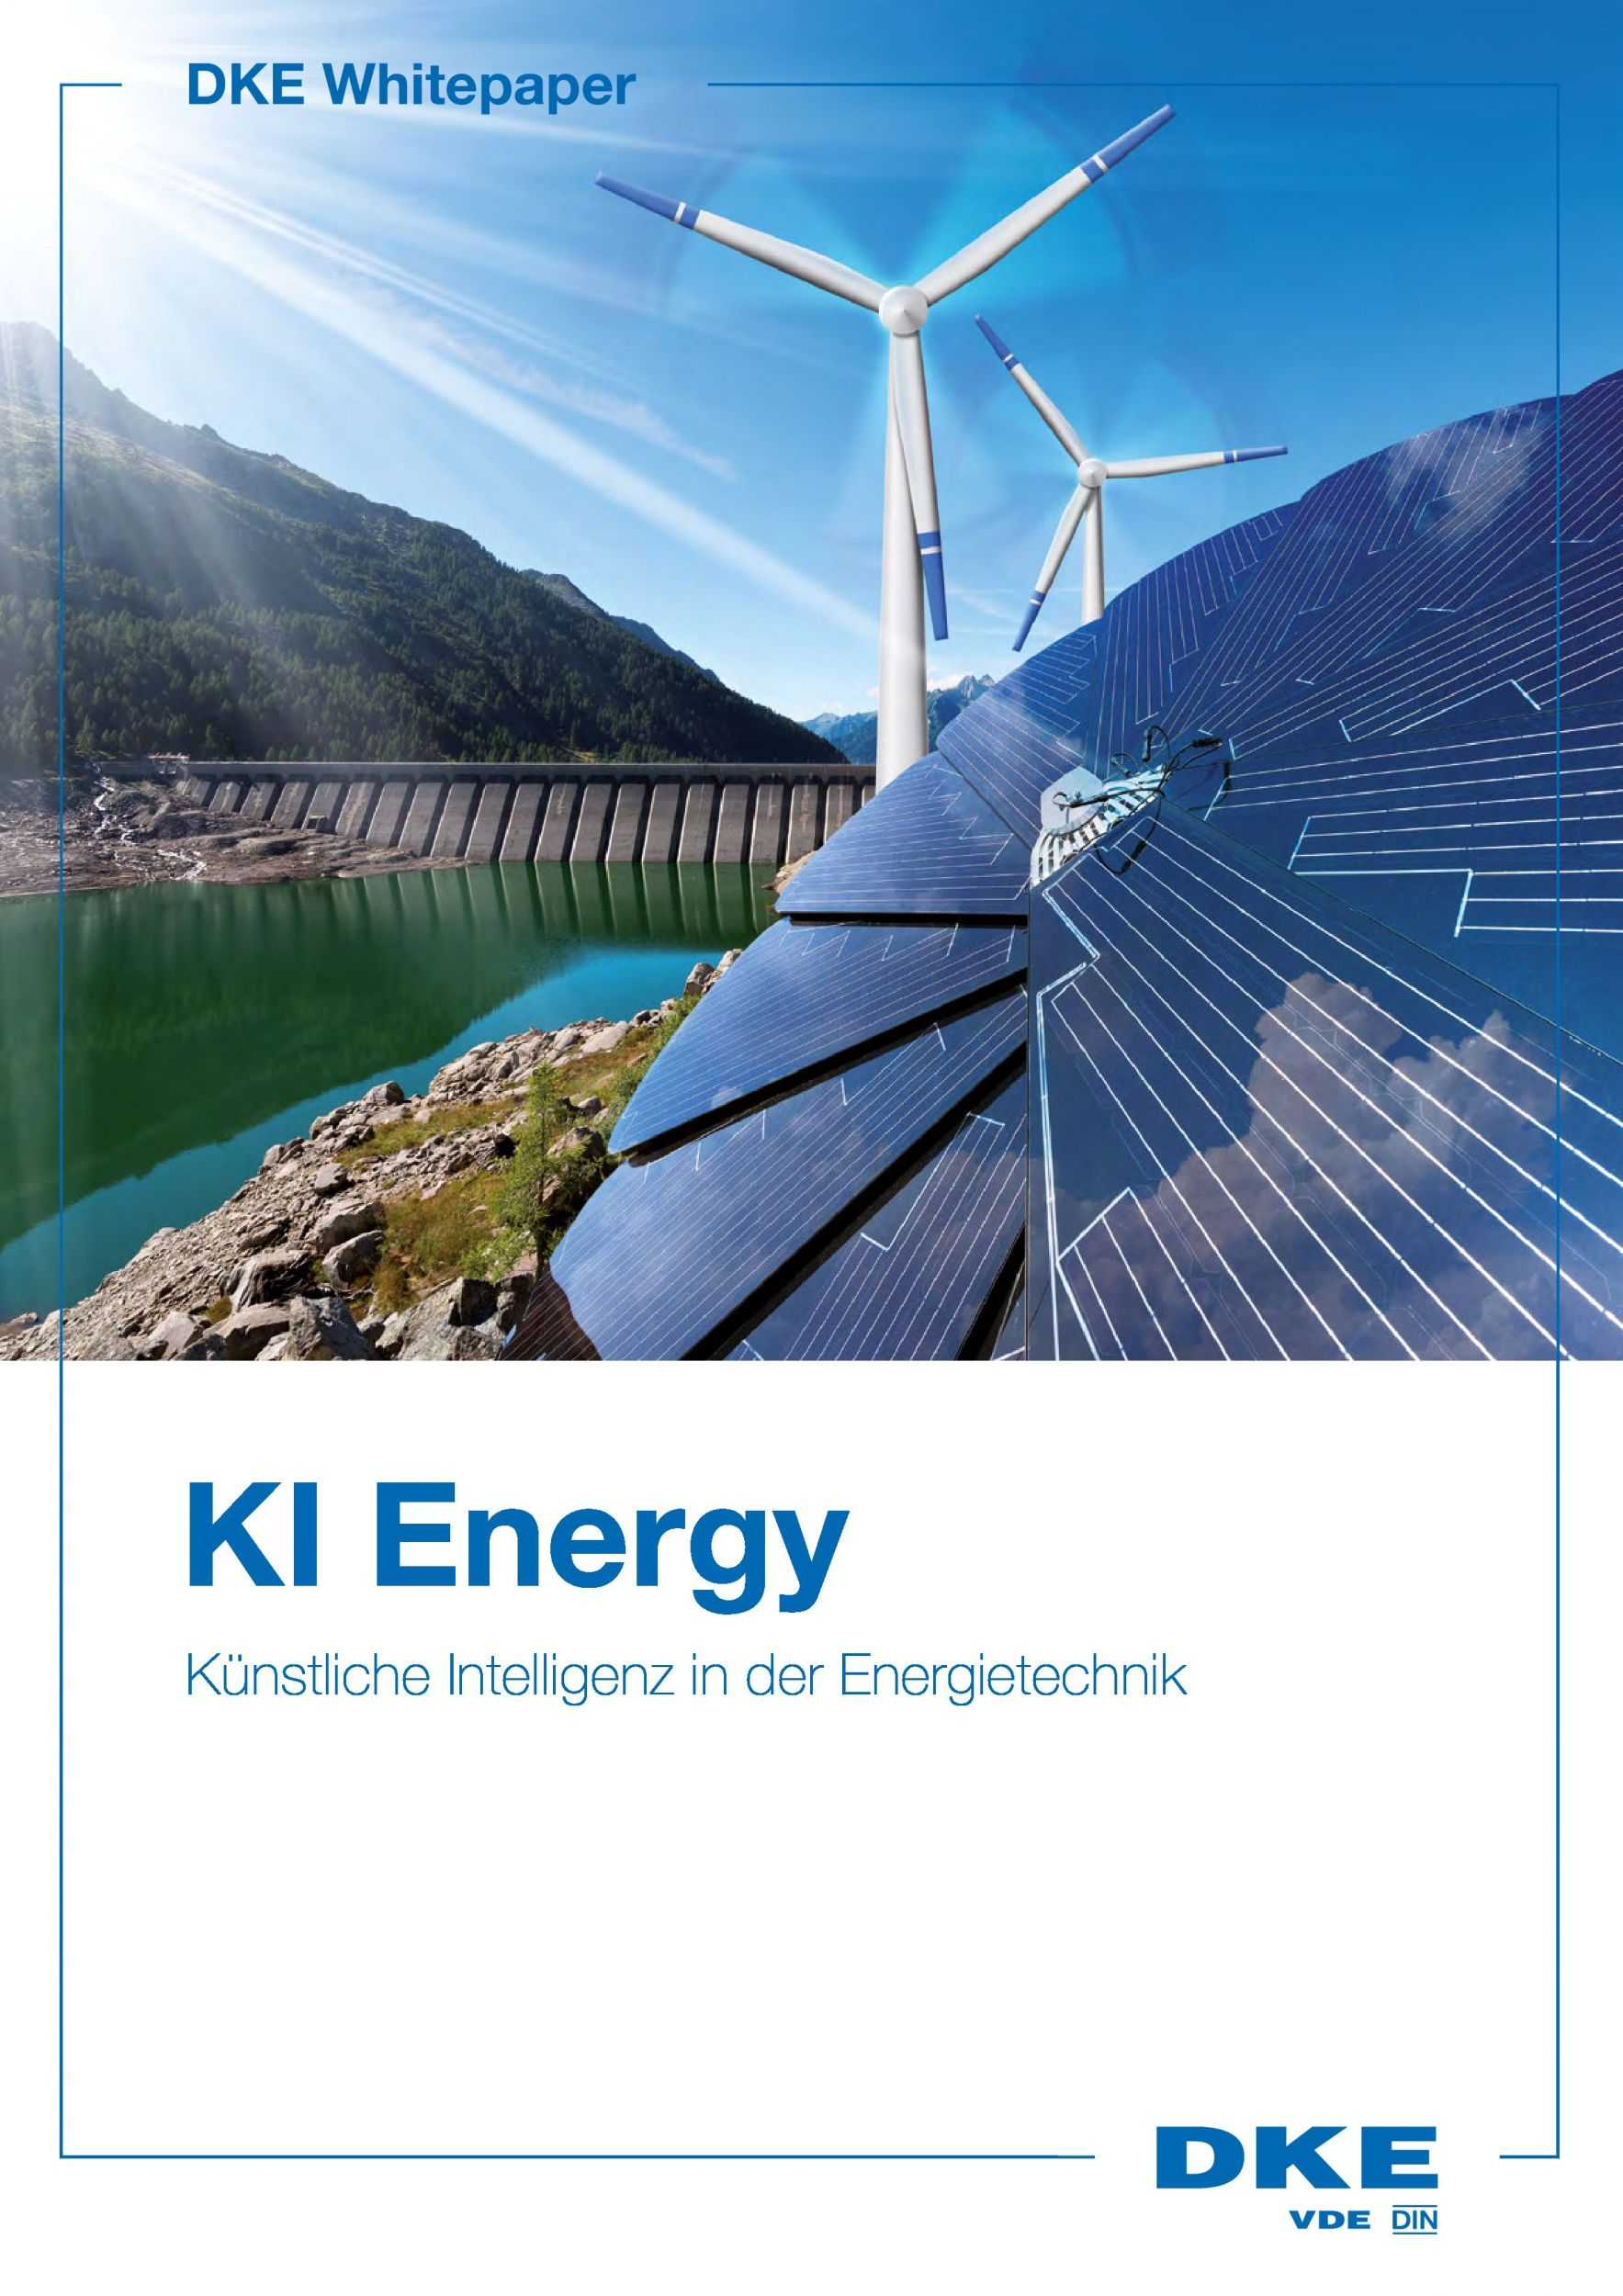 DKE veröffentlicht Whitepaper KI Energy